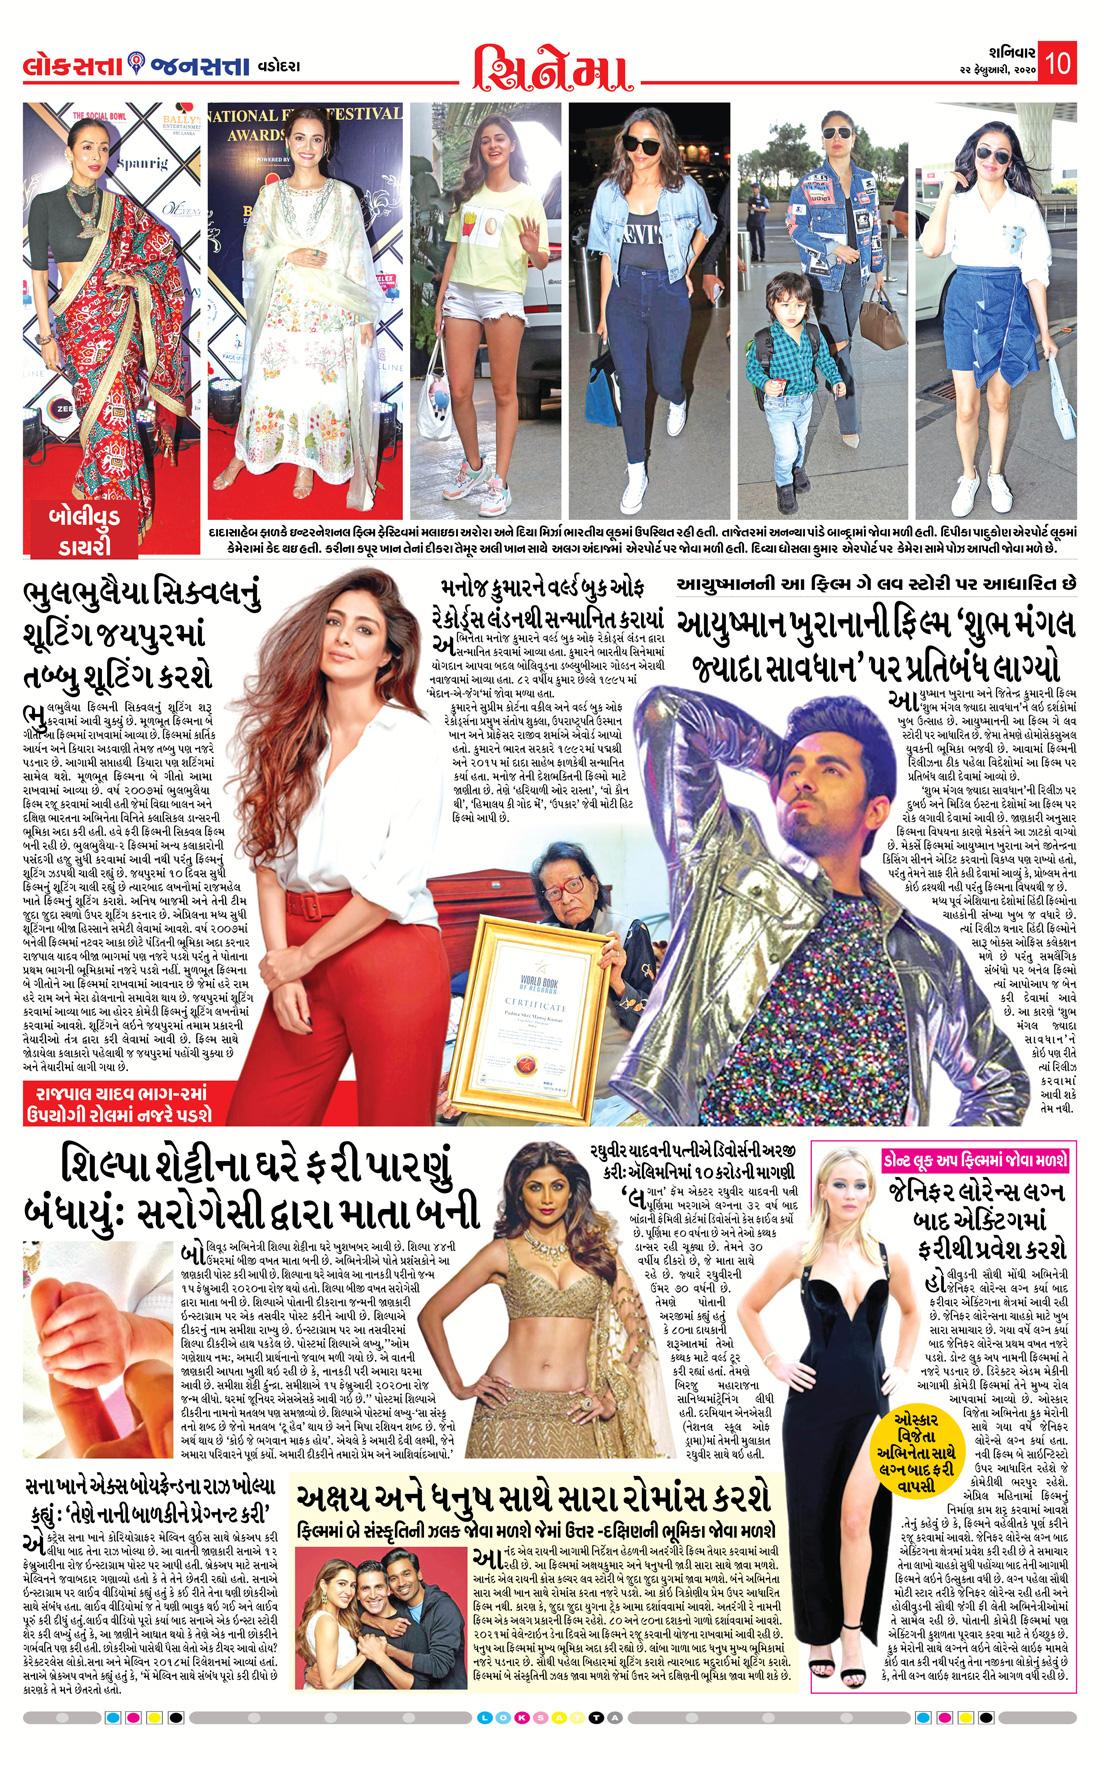 Loksatta Jansatta News Papaer E-paper dated 2020-02-22 | Page 10